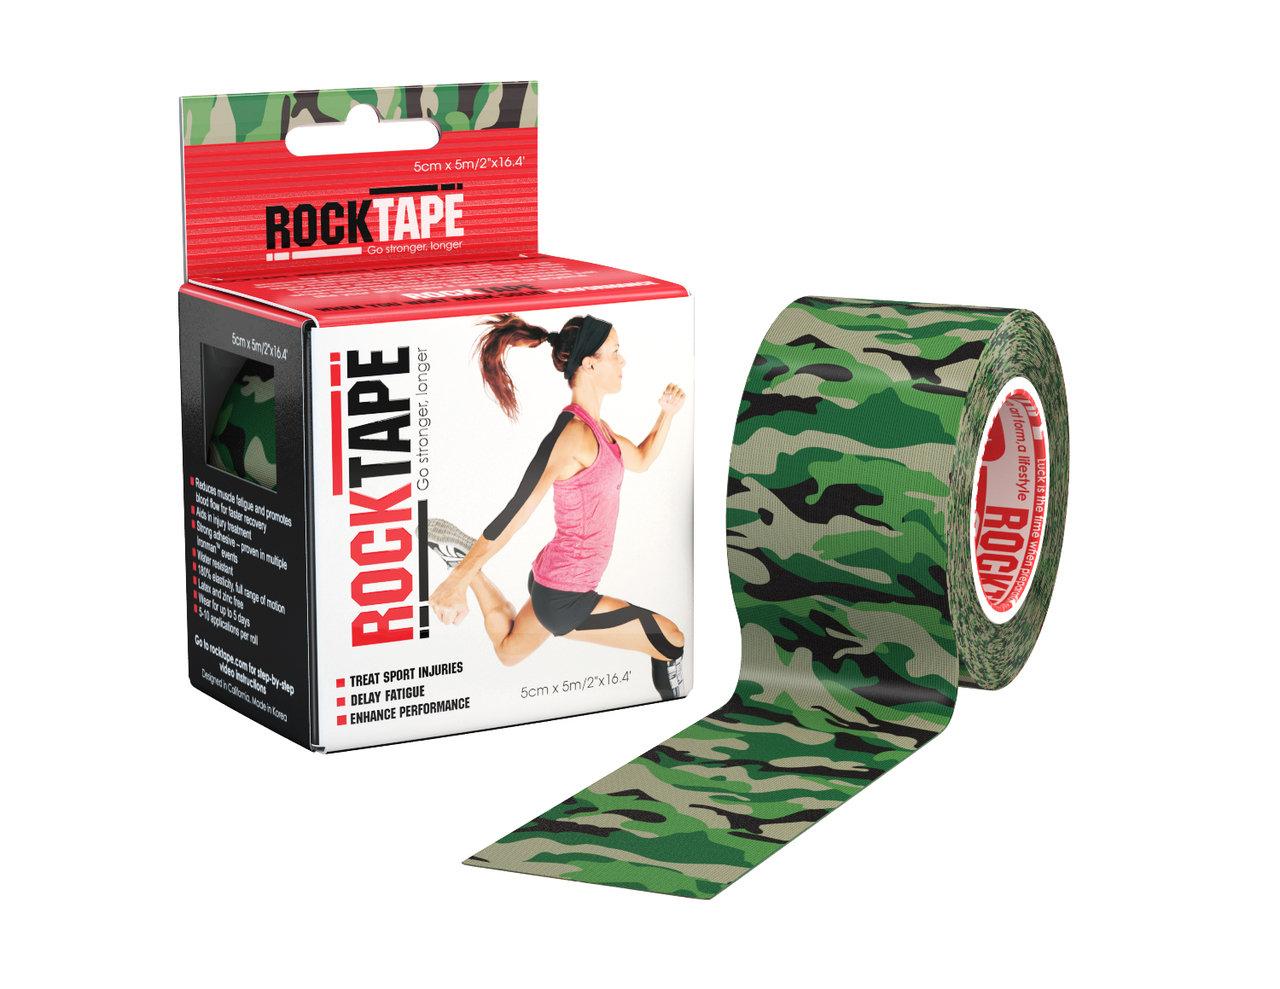 RockTape, 5см х 5м, Green Camouflage